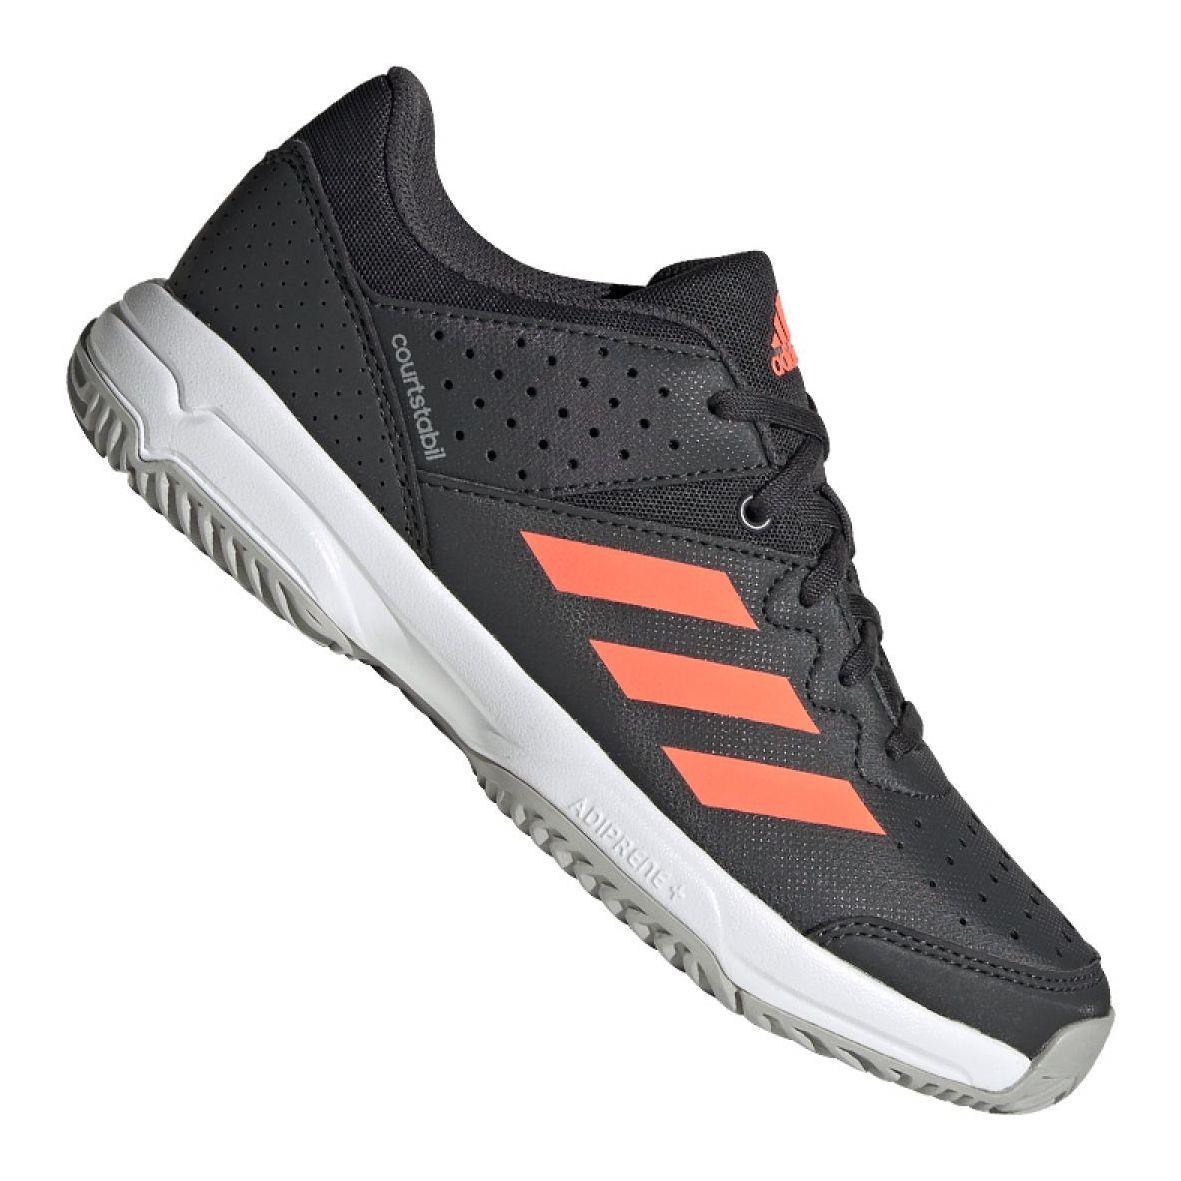 Buty Adidas Court Stabil Jr Eh2557 Czarne Wielokolorowe In 2021 Black Shoes Adidas Shoes